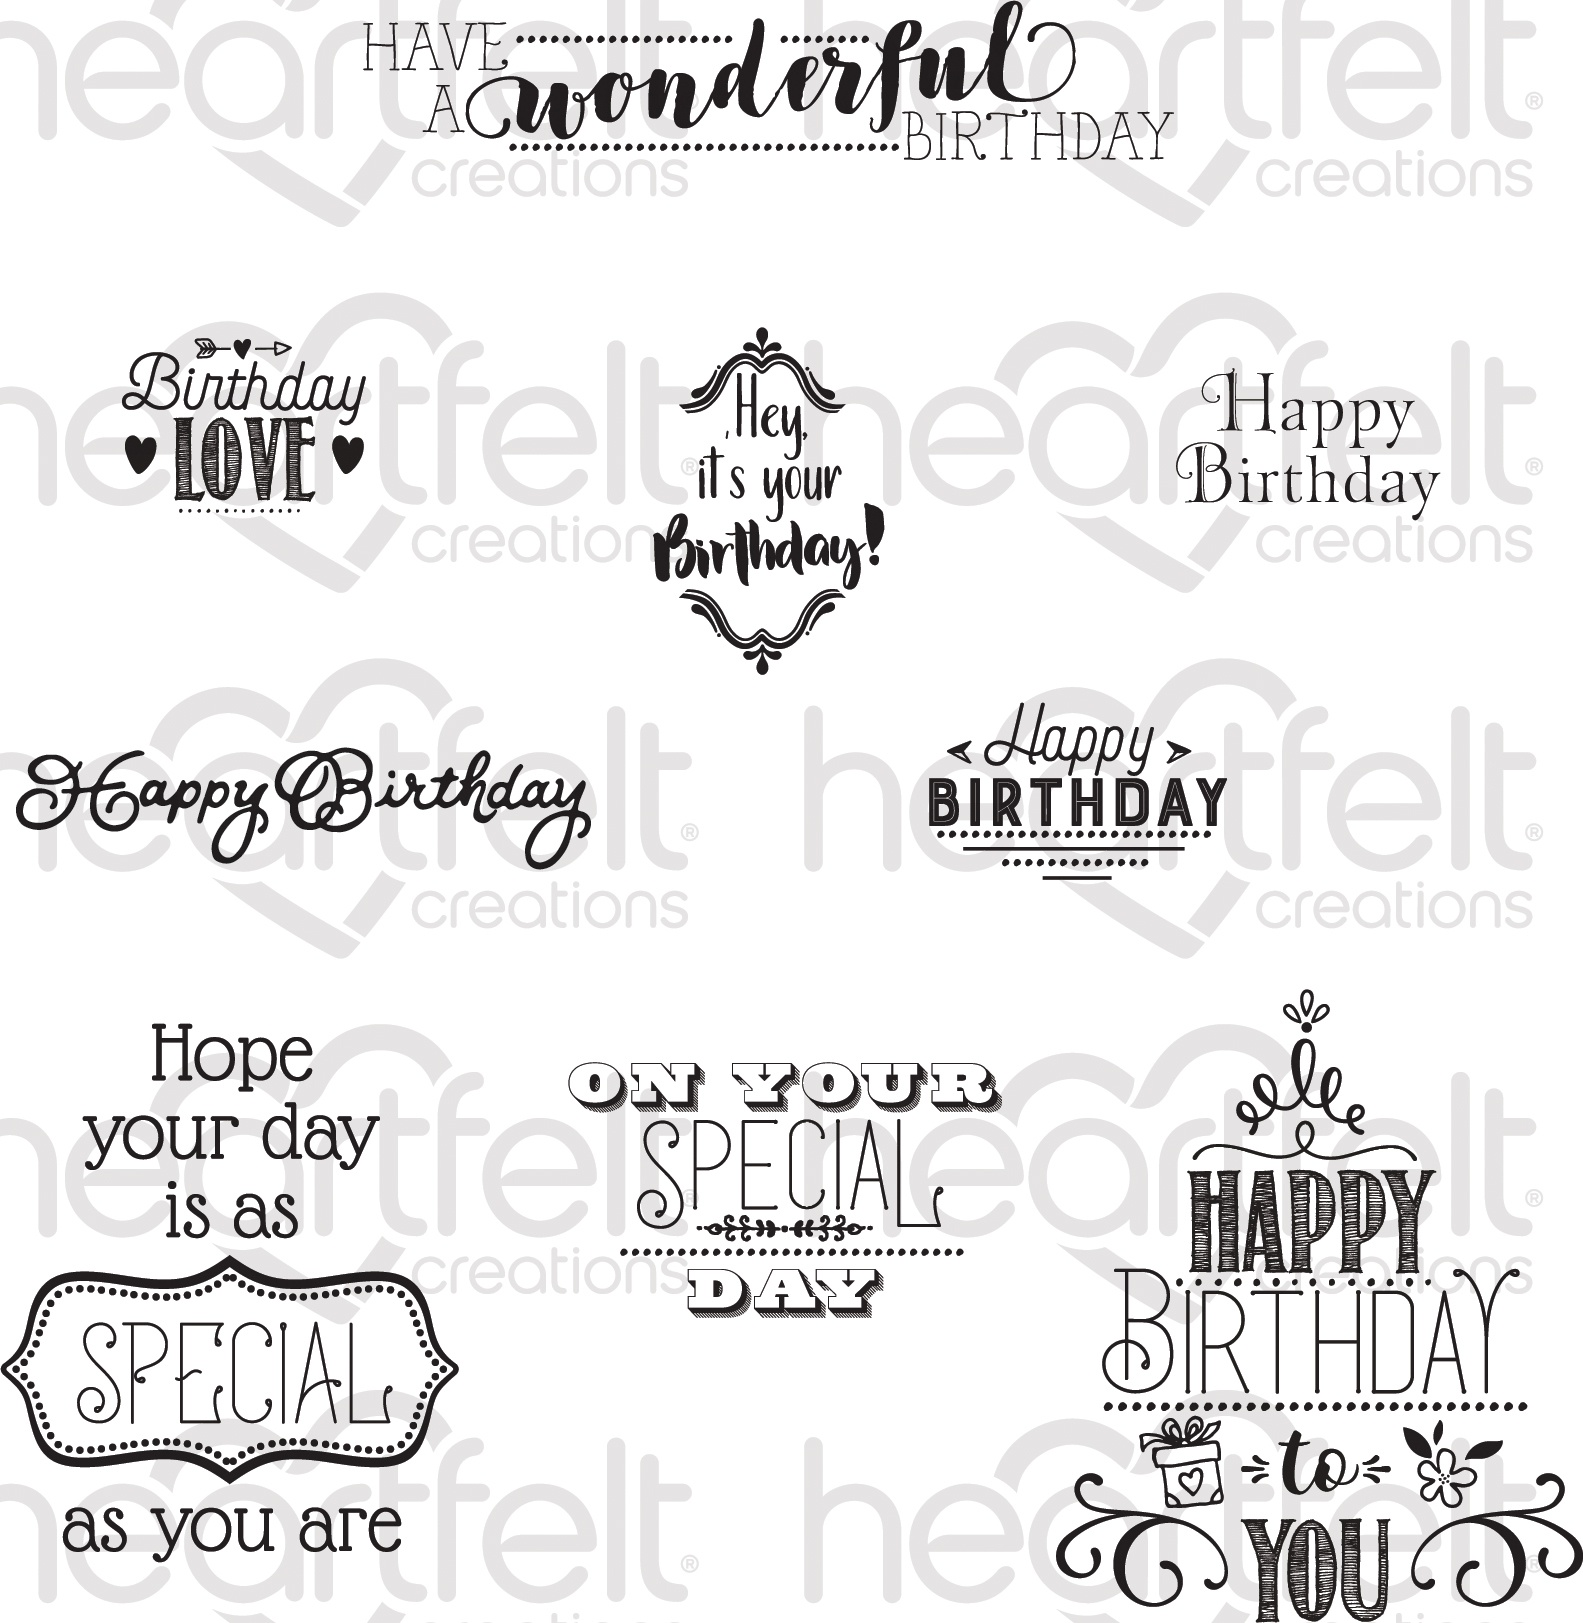 Heartfelt Creations special Birthday Sentiments Stamp